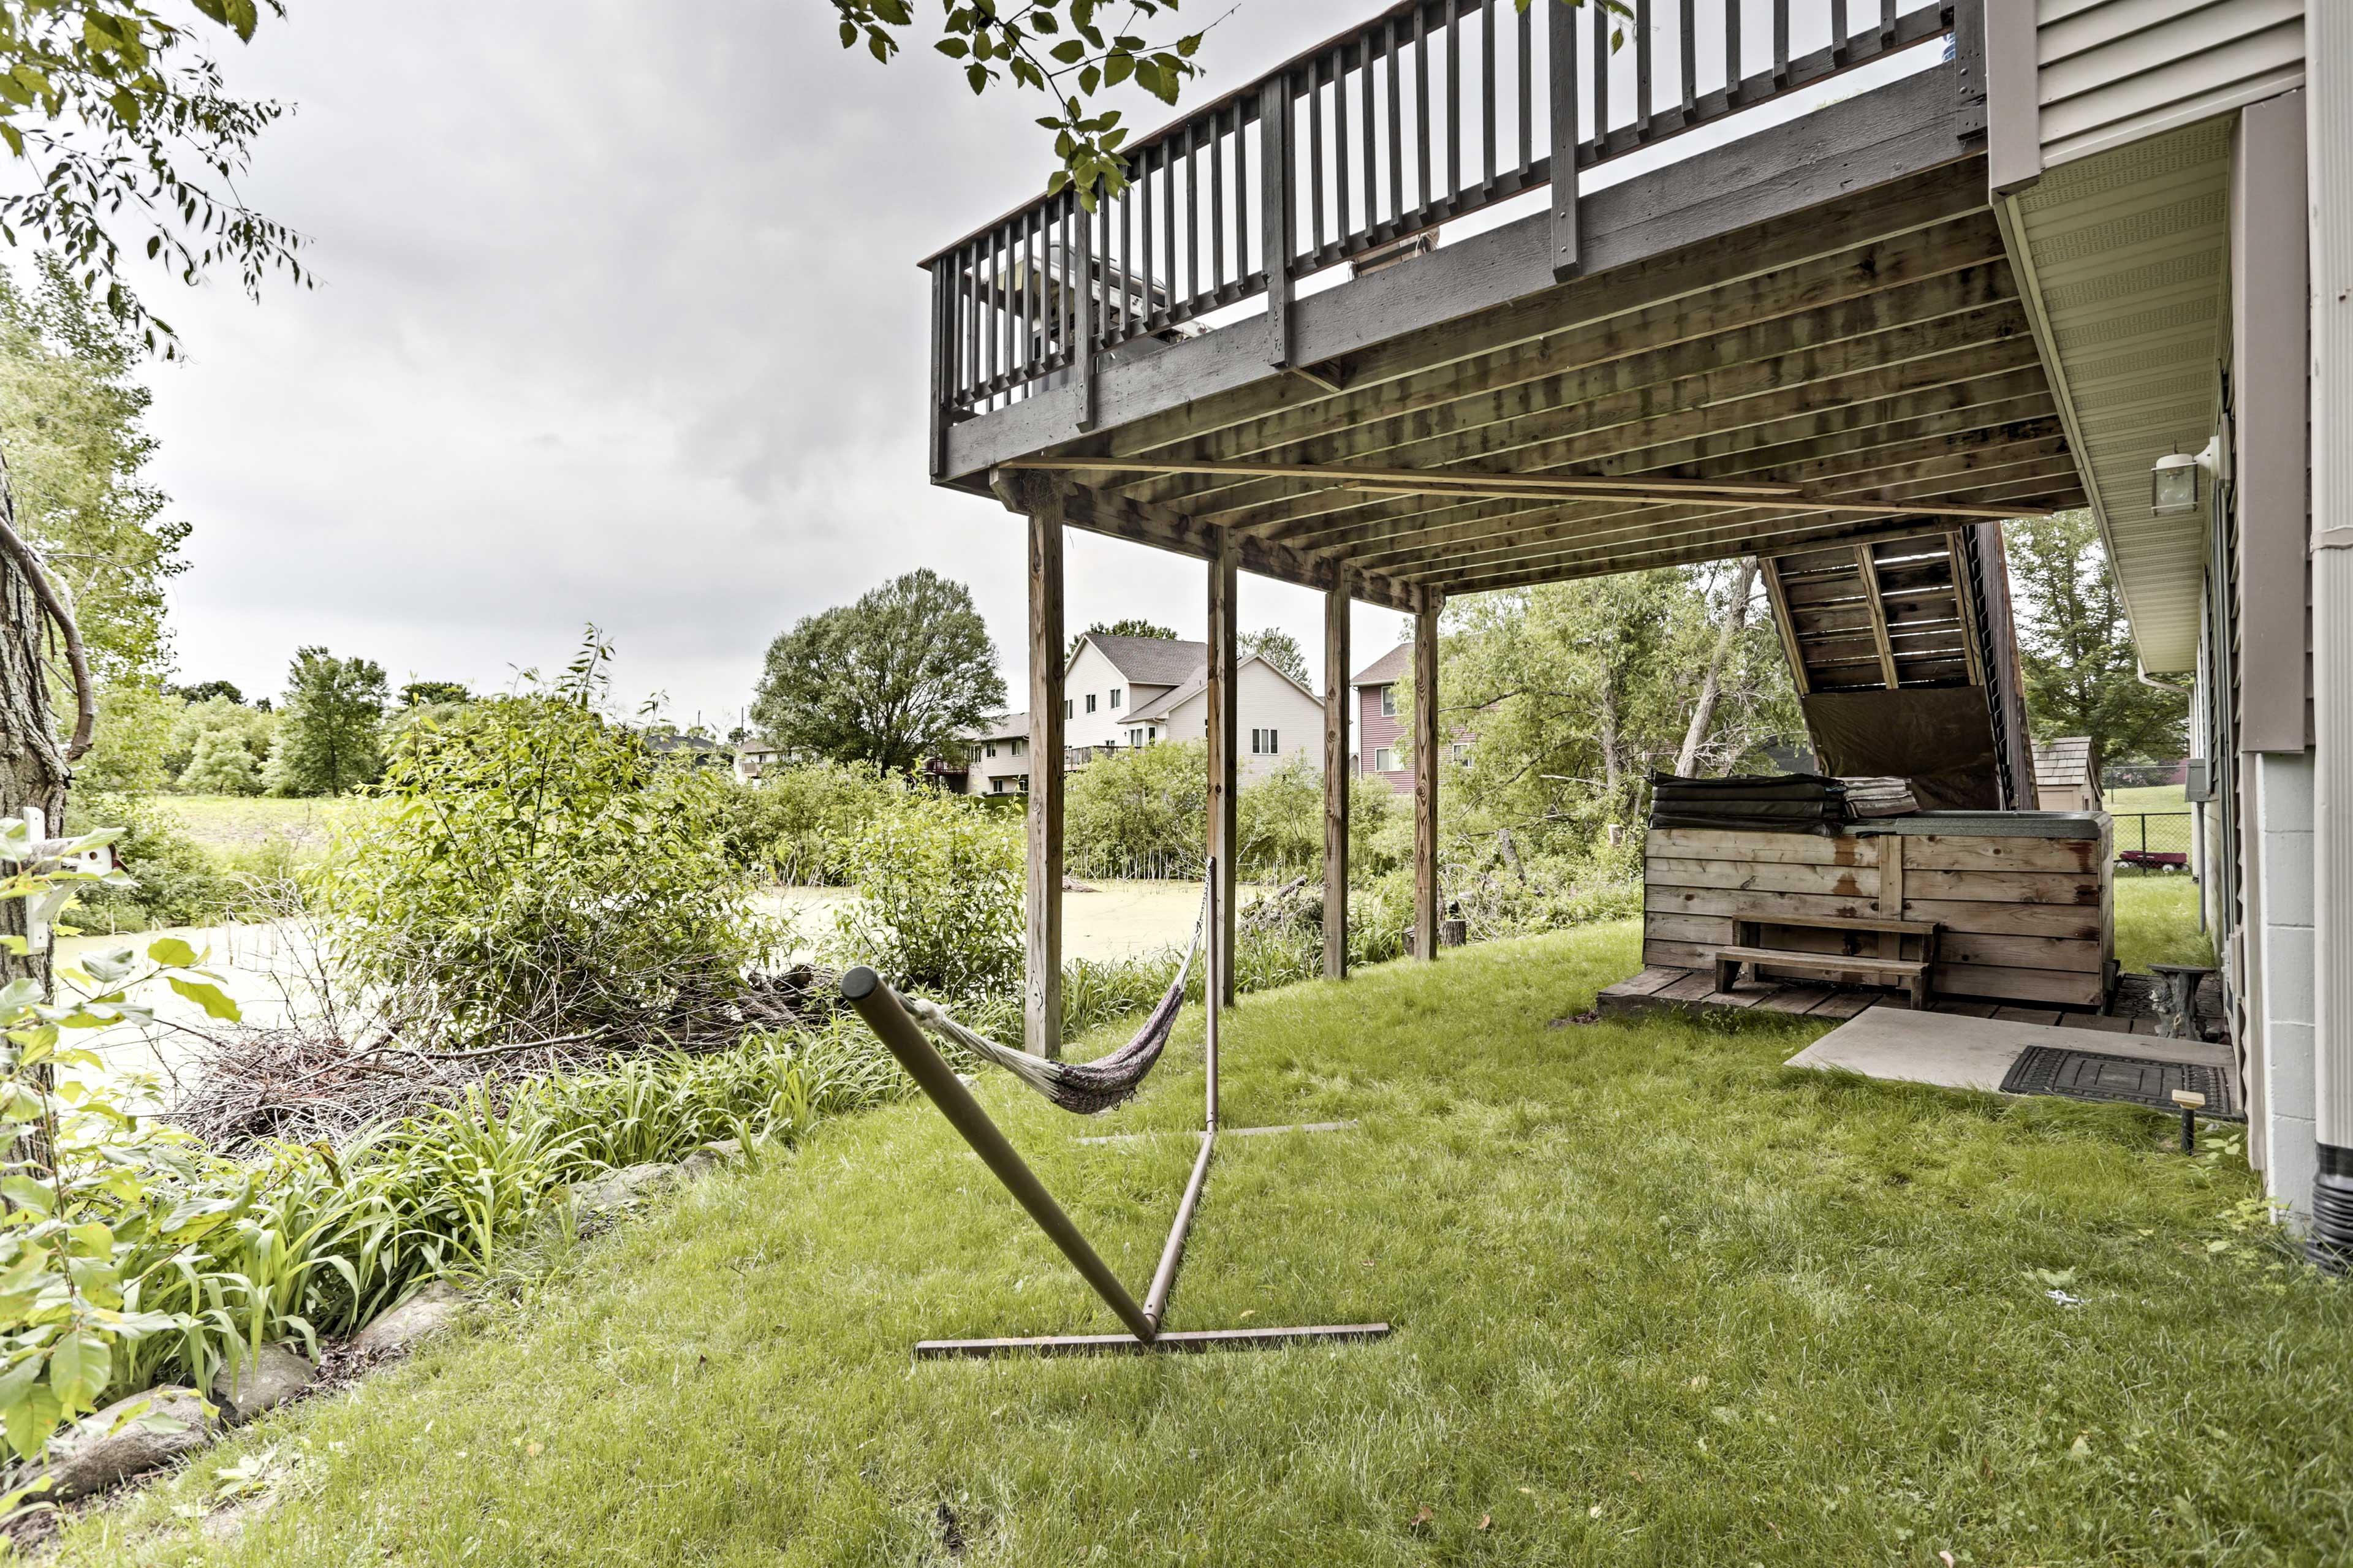 Explore the backyard pond on a walk with Fido!